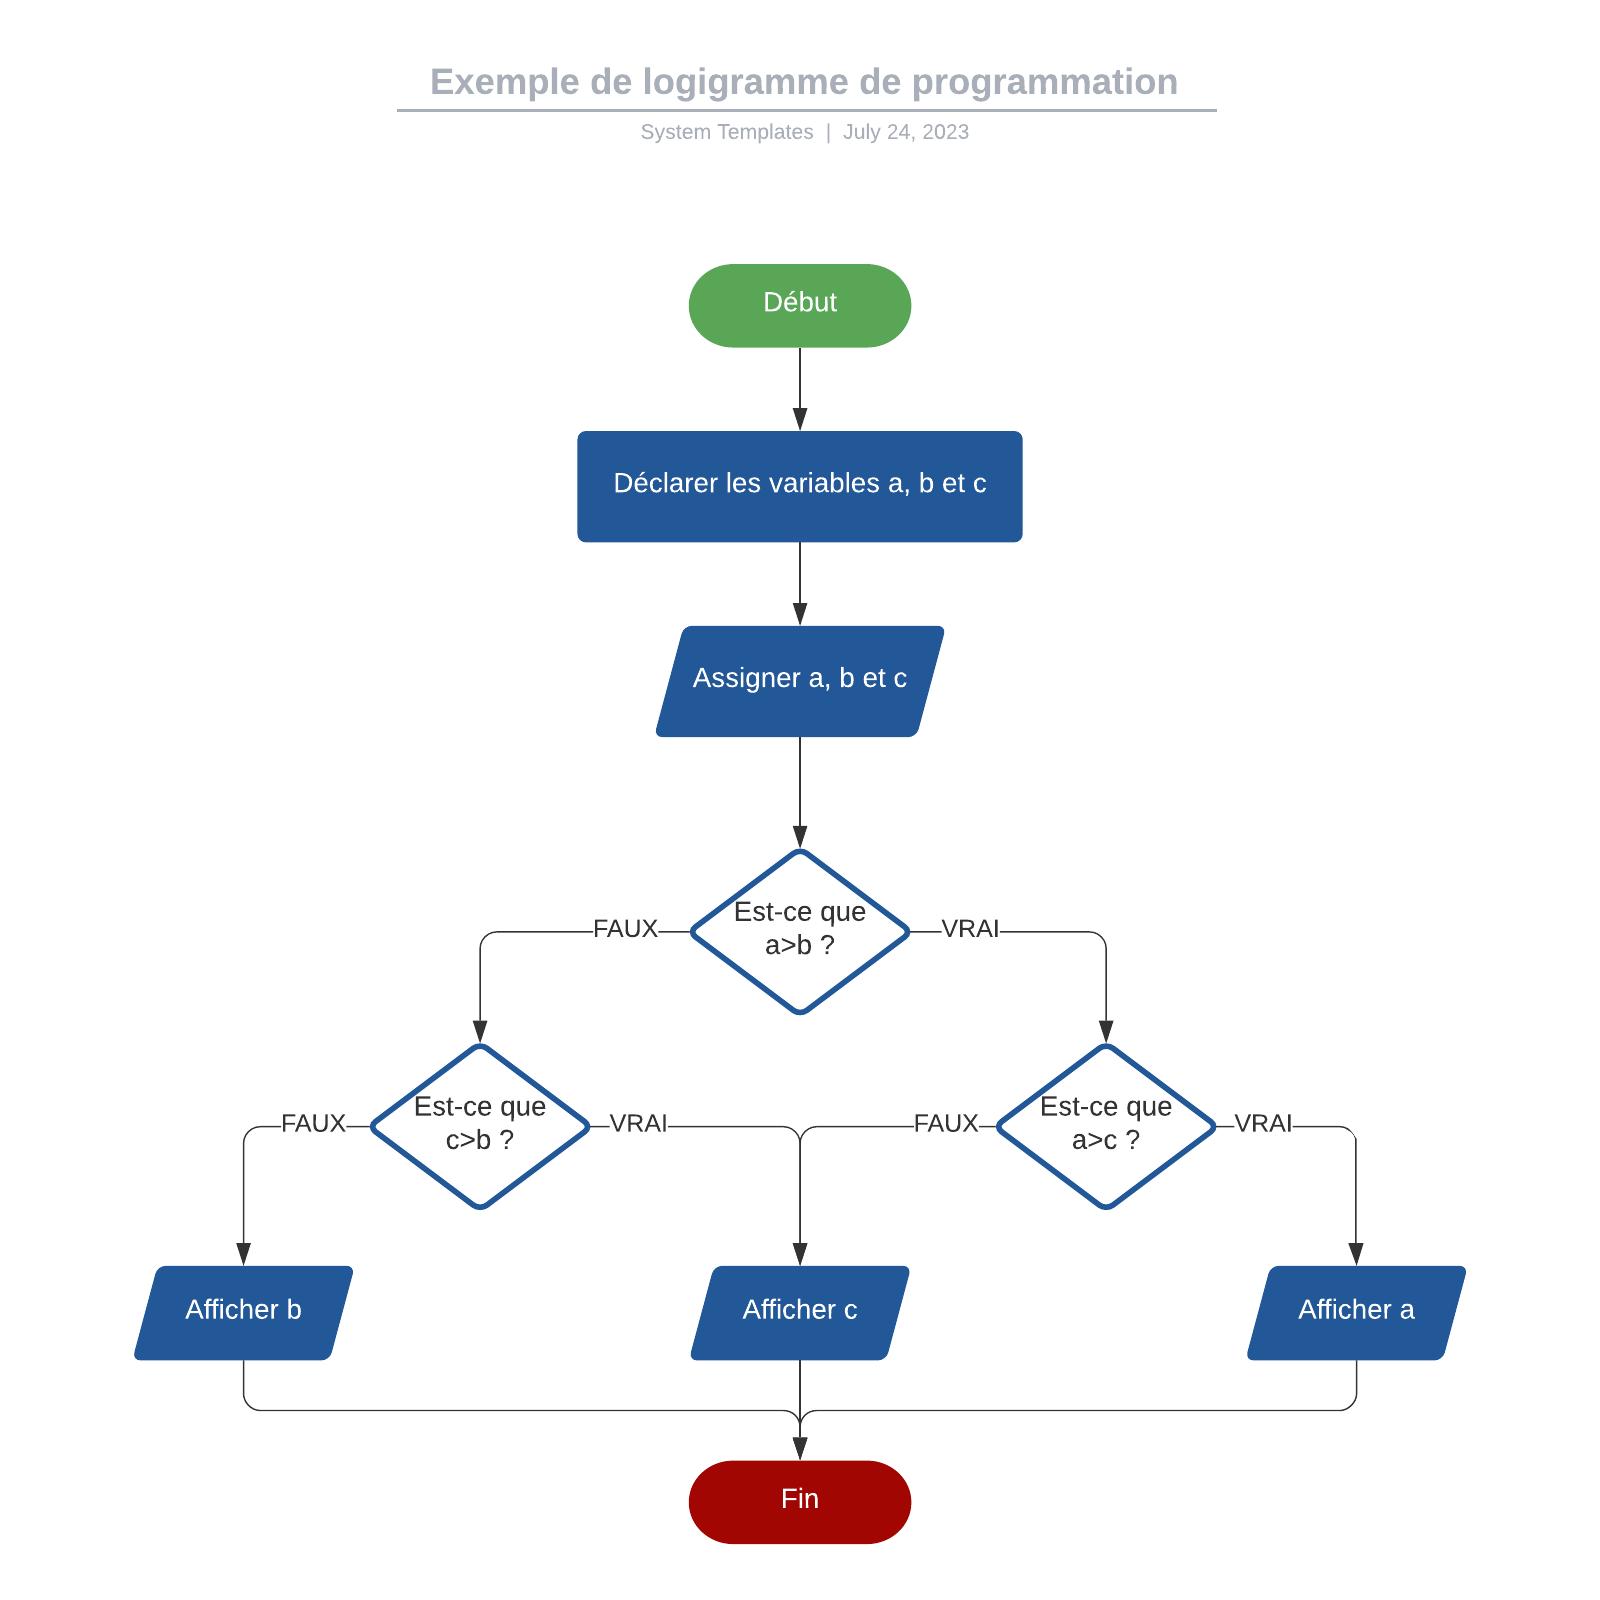 Exemple de logigramme de programmation